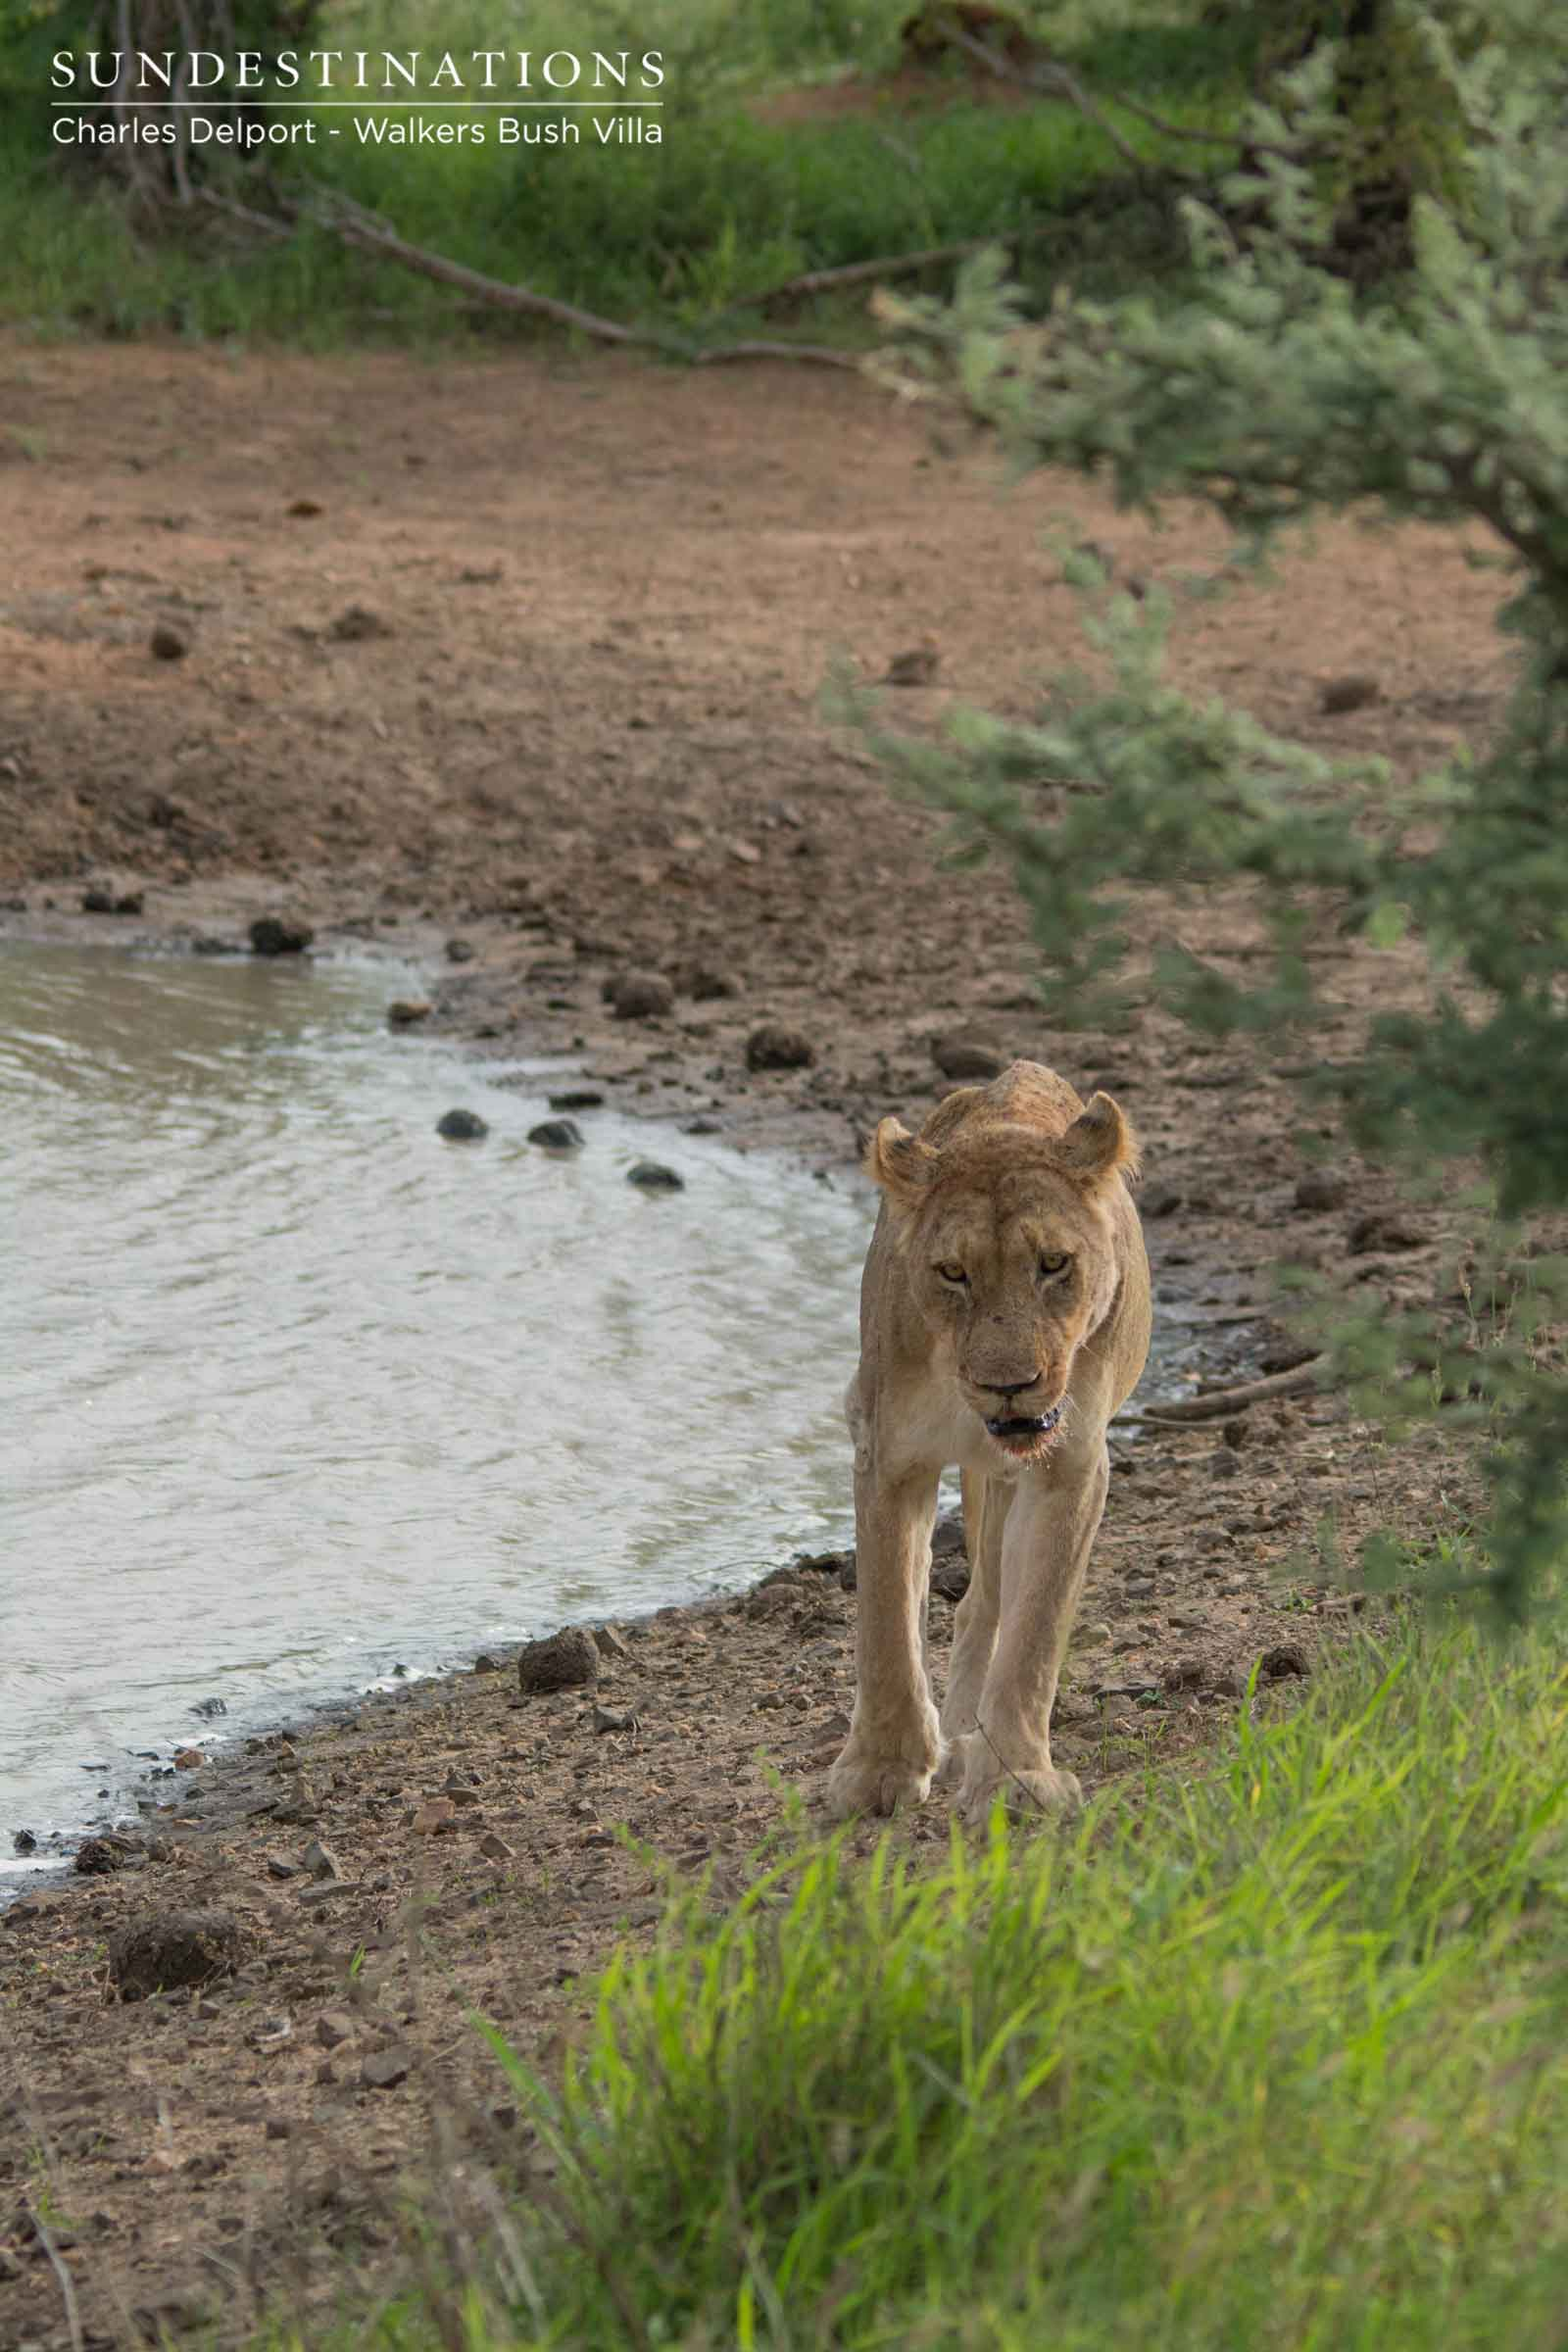 Lone Lioness form Giraffe Pride